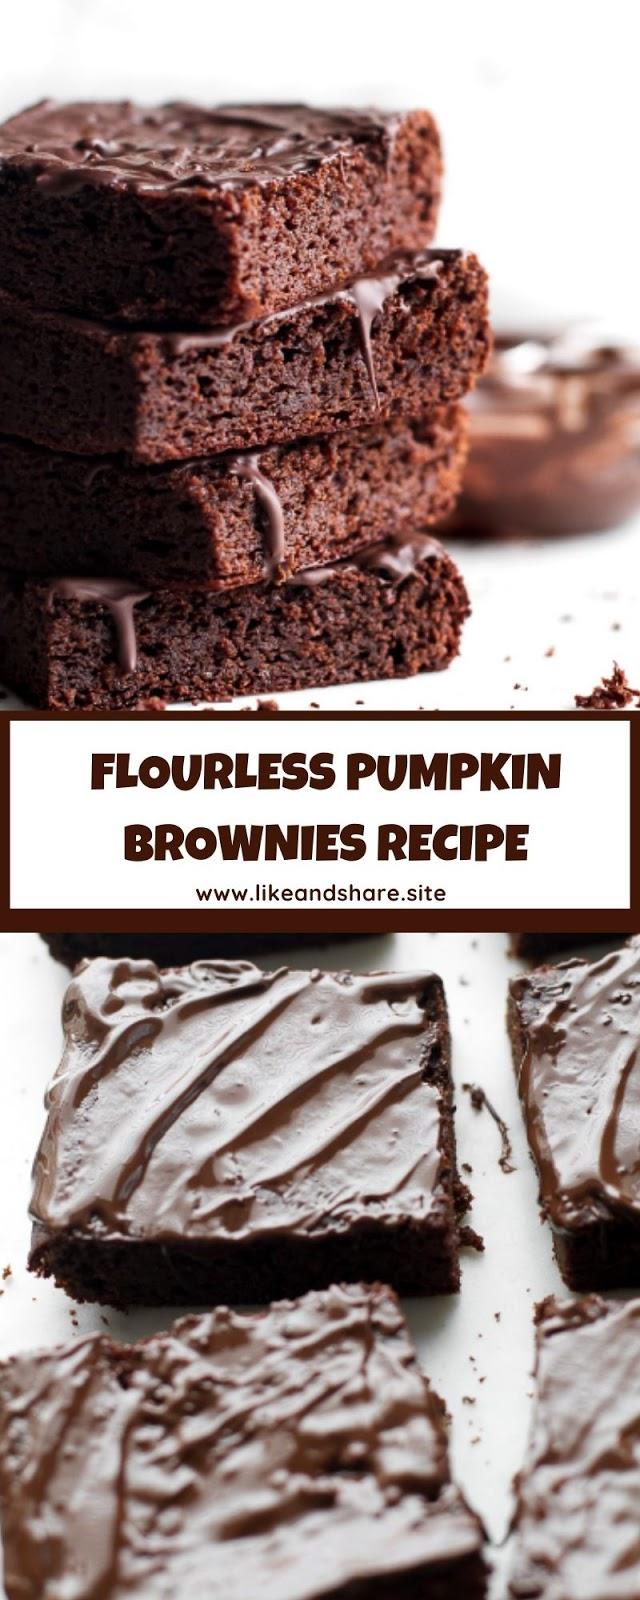 FLOURLESS PUMPKIN BROWNIES RECIPE